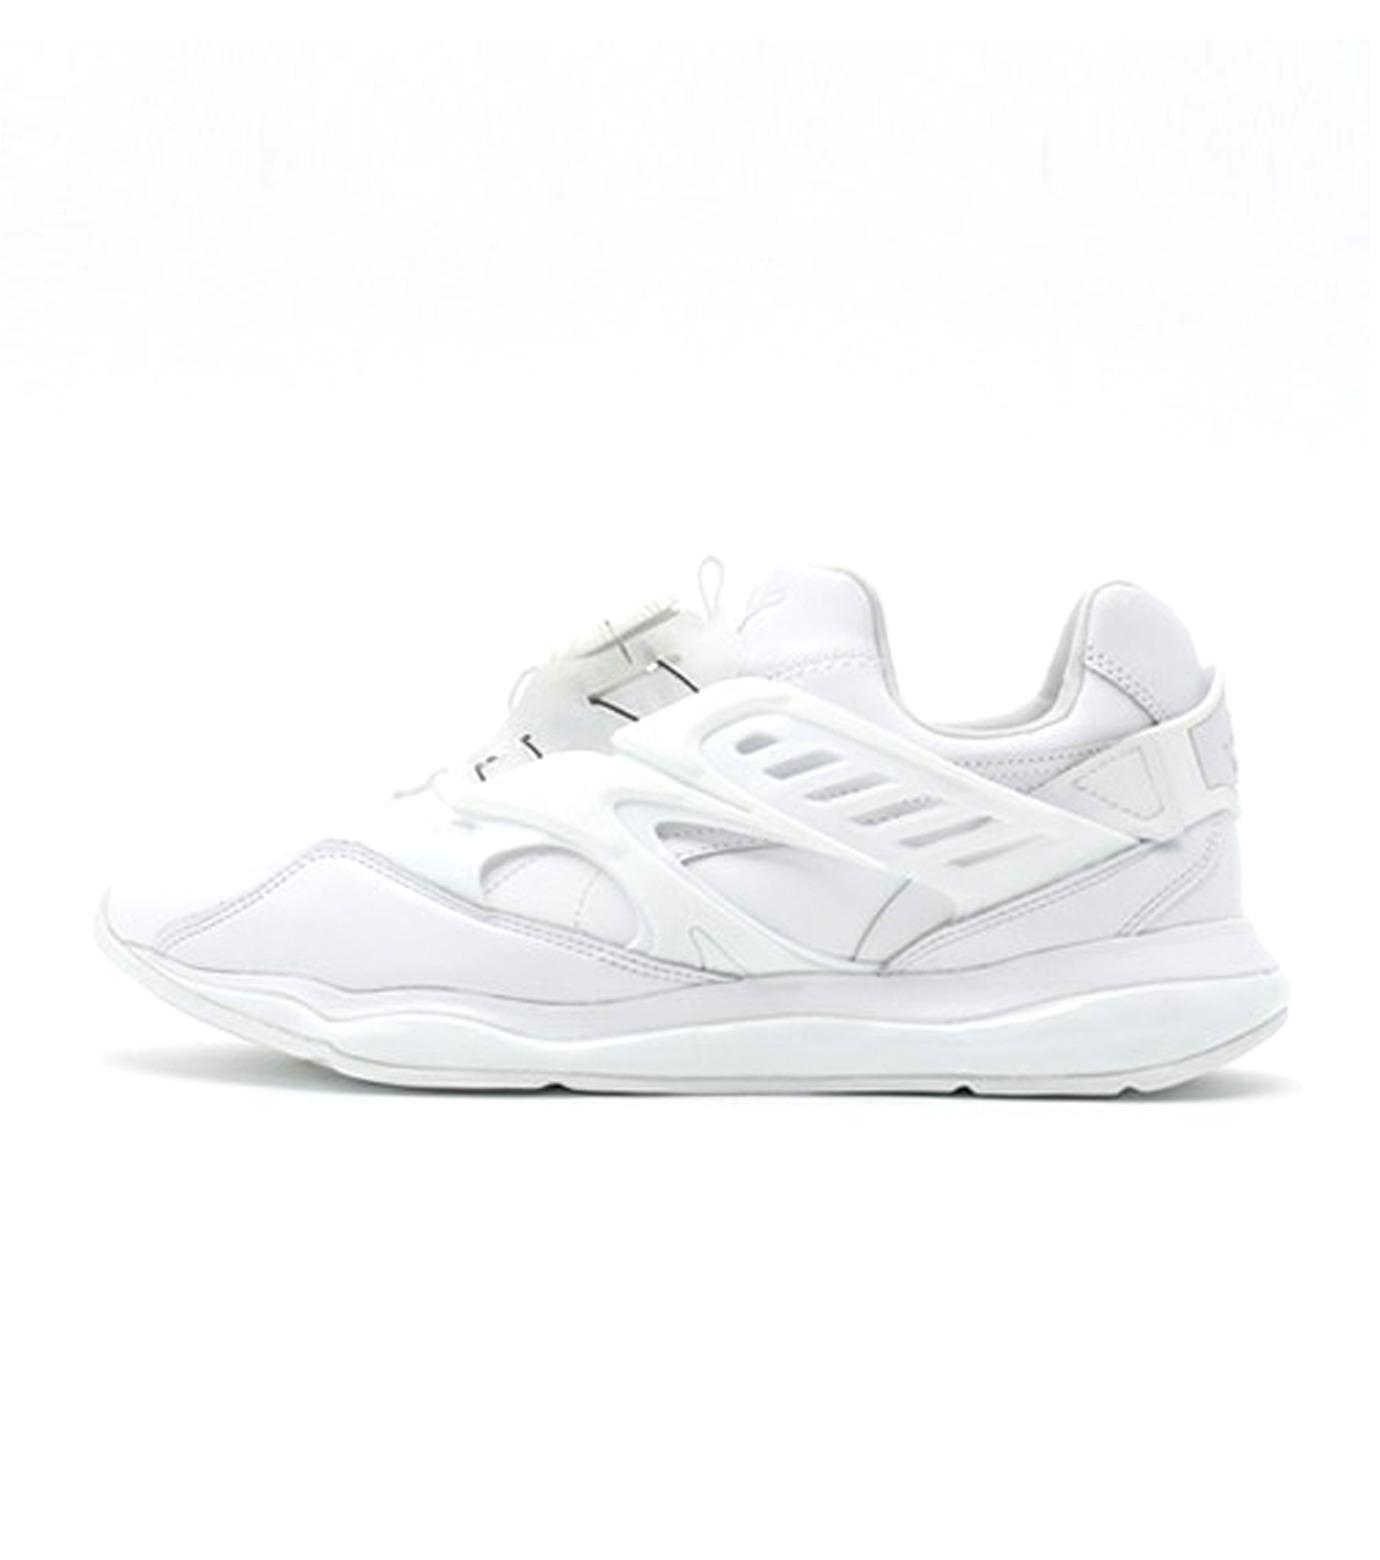 PUMA(プーマ)のDISC BLAZE CELL-WHITE(シューズ/shoes)-360078-4 拡大詳細画像1